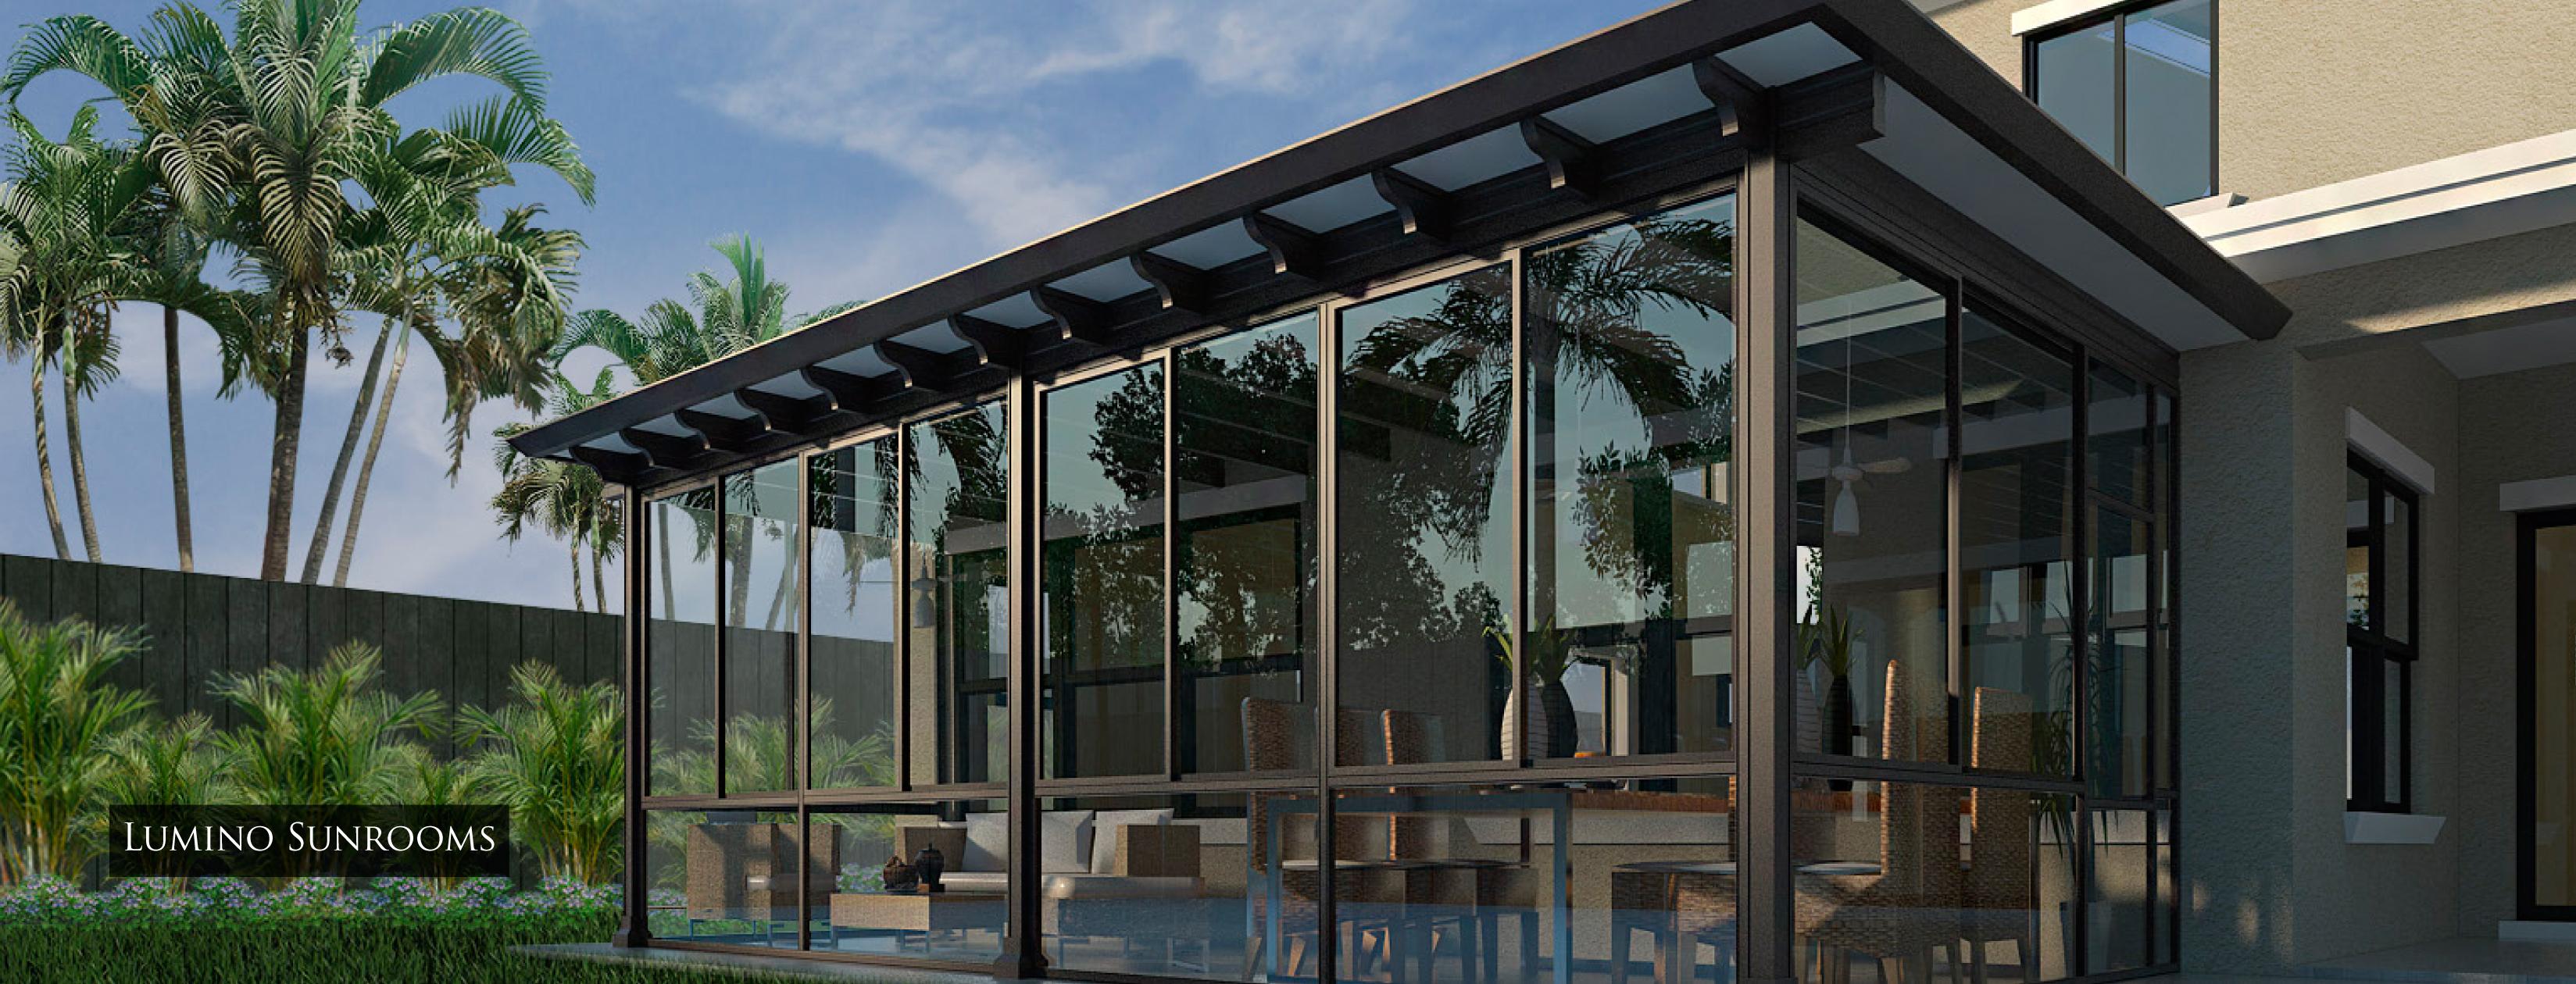 Renaissance Sunrooms Dunedin FL